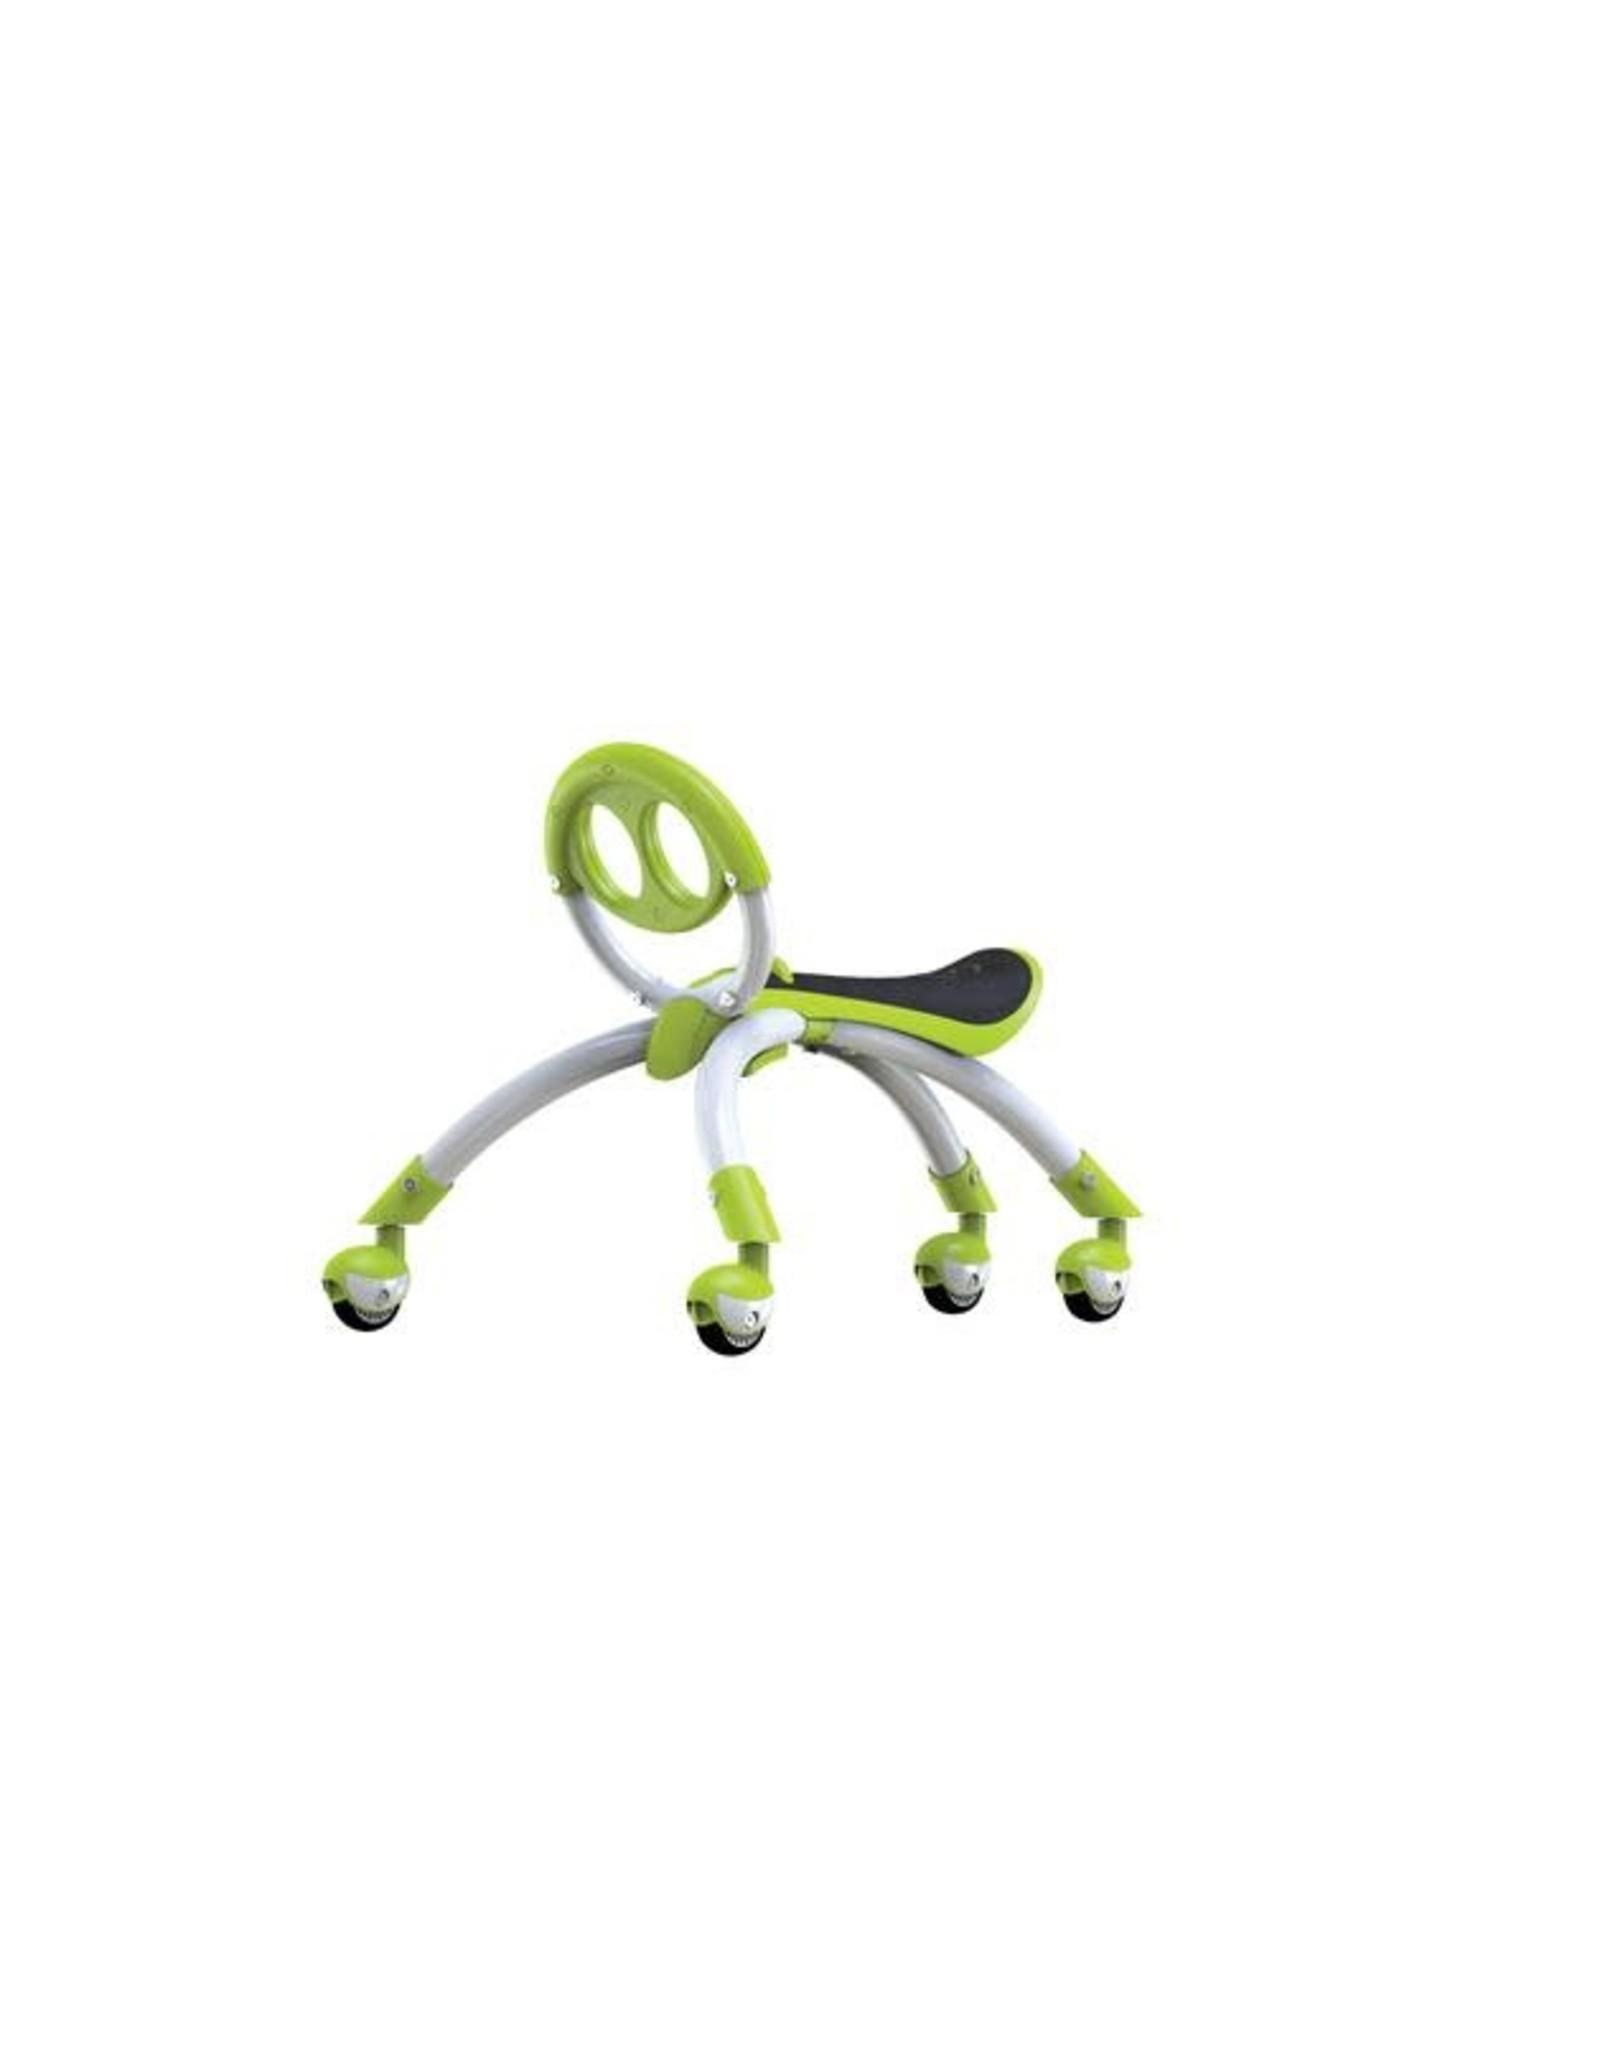 National Sporting Goods Co. YBike Pewi Elite, Green